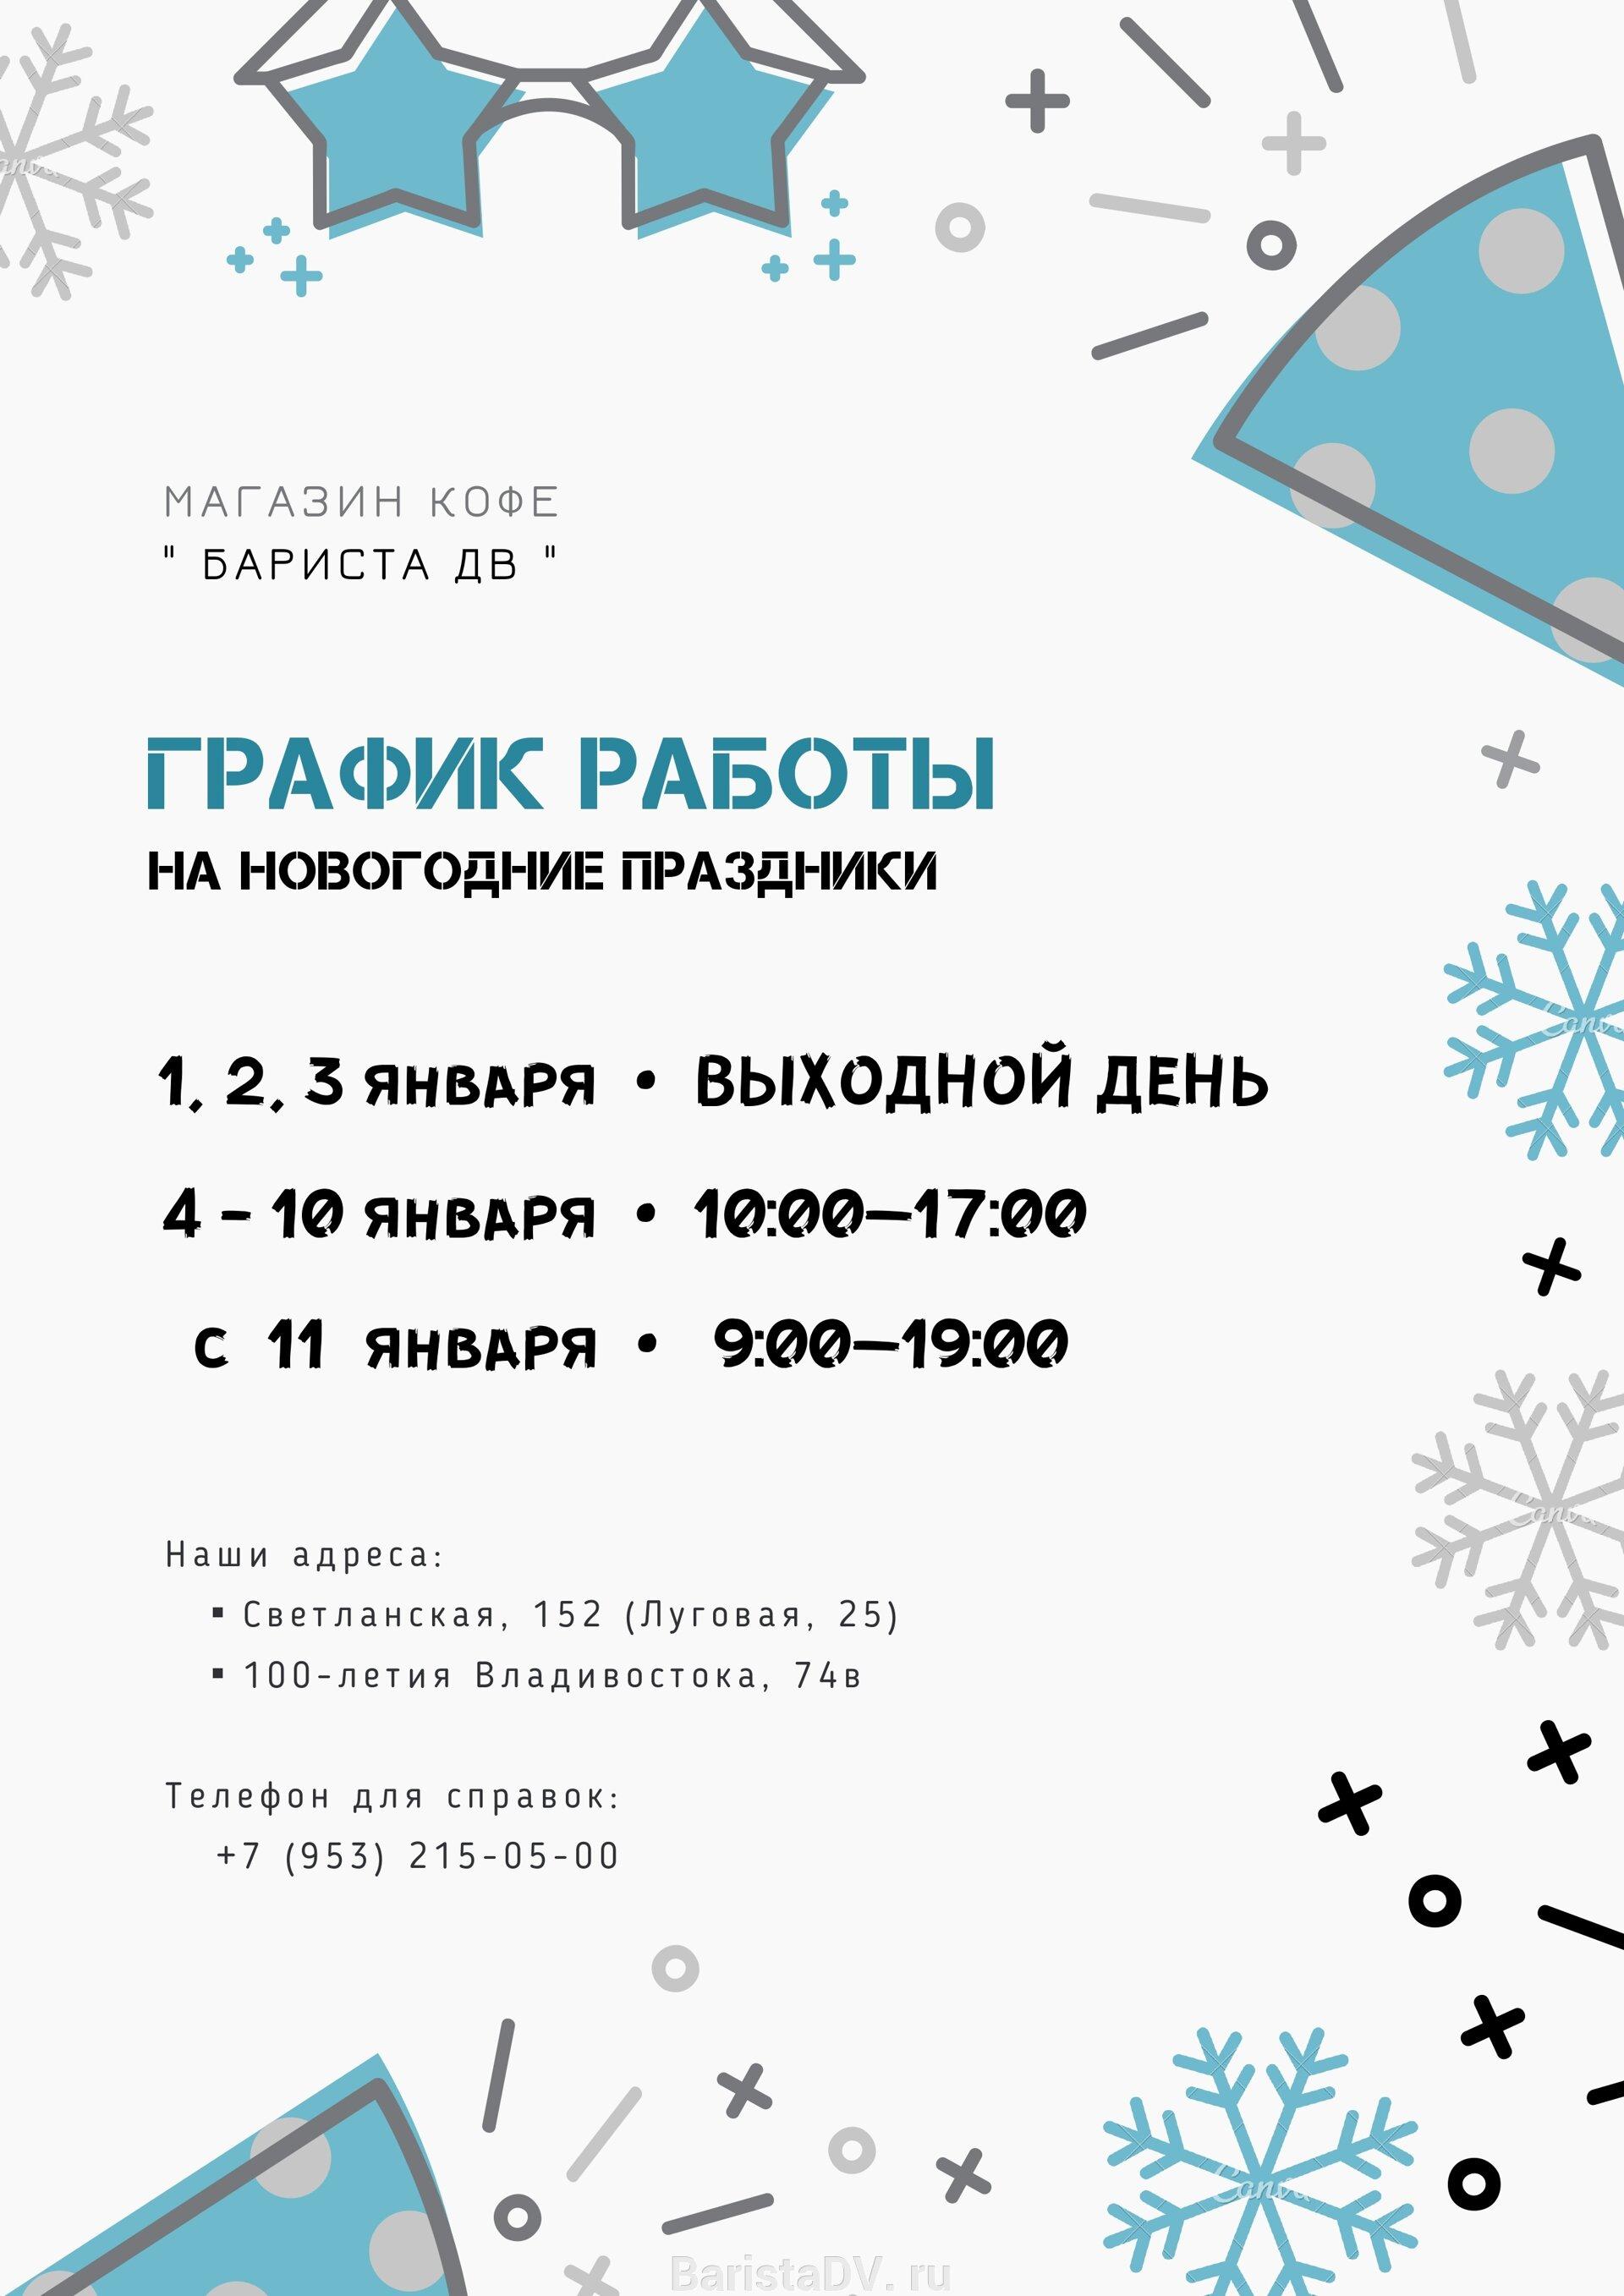 График работы в новогодние праздники 2021 - фото pic_e93880fc935d96bd38cf303e0e076c16_1920x9000_1.jpg